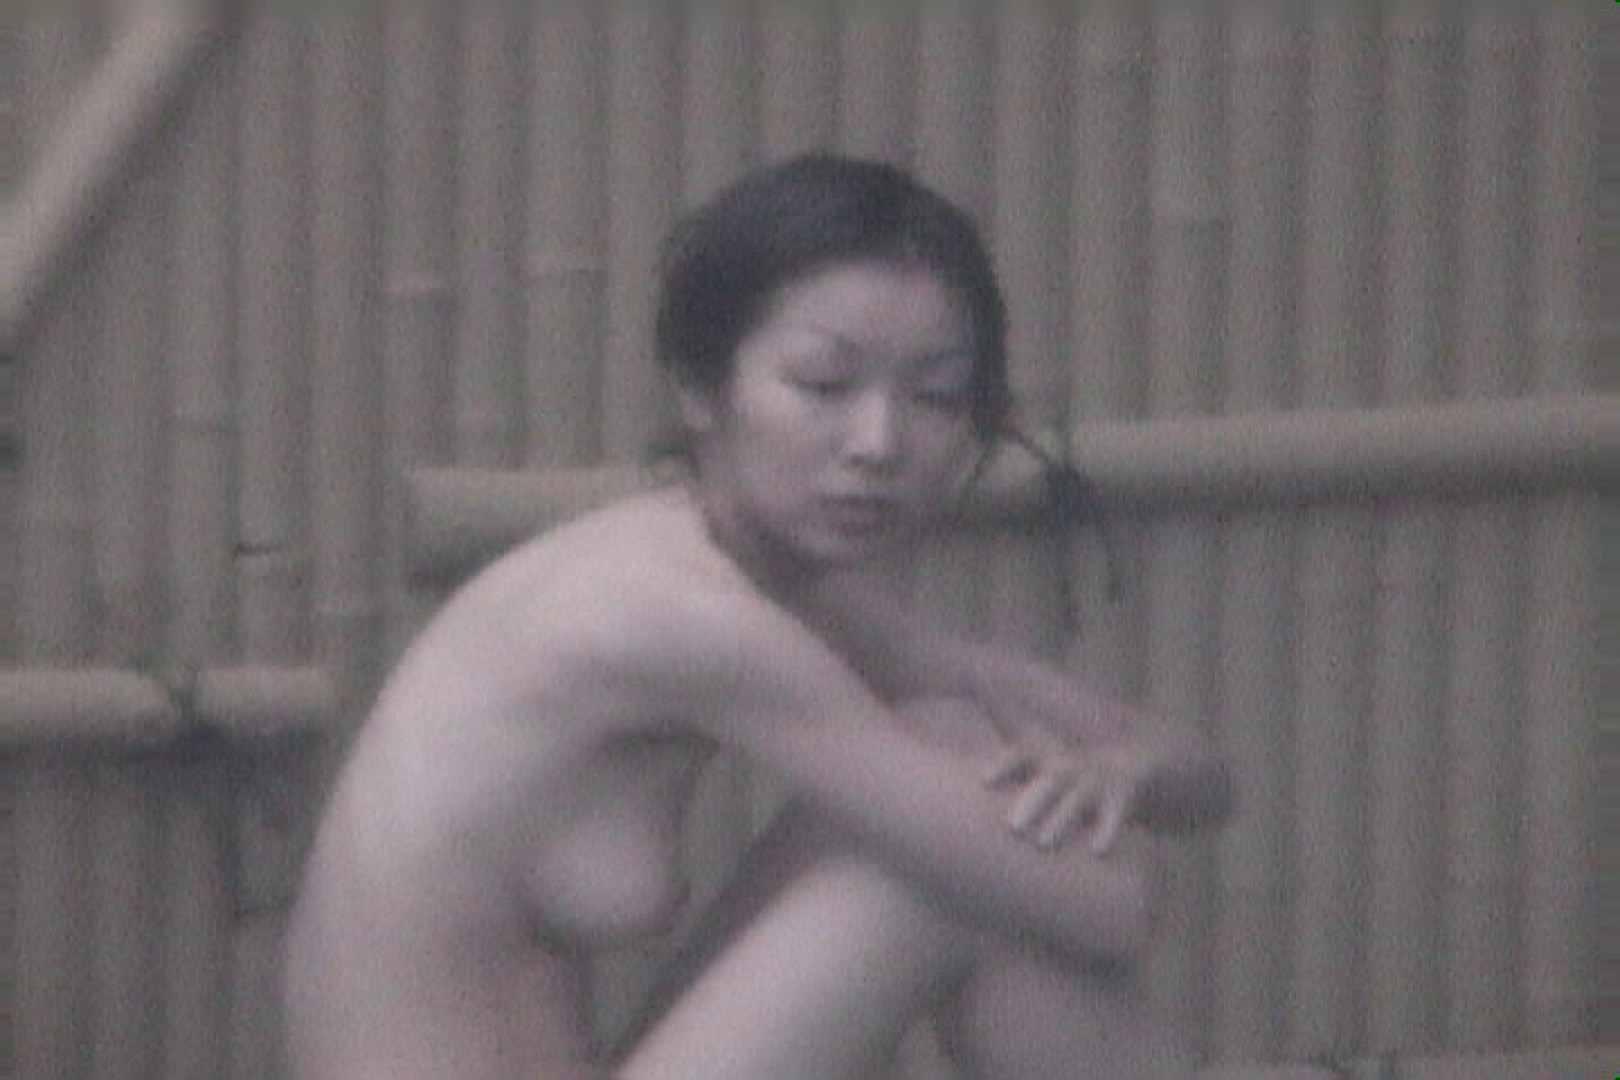 Aquaな露天風呂Vol.82【VIP限定】 露天風呂 | OLのエロ生活  51連発 49